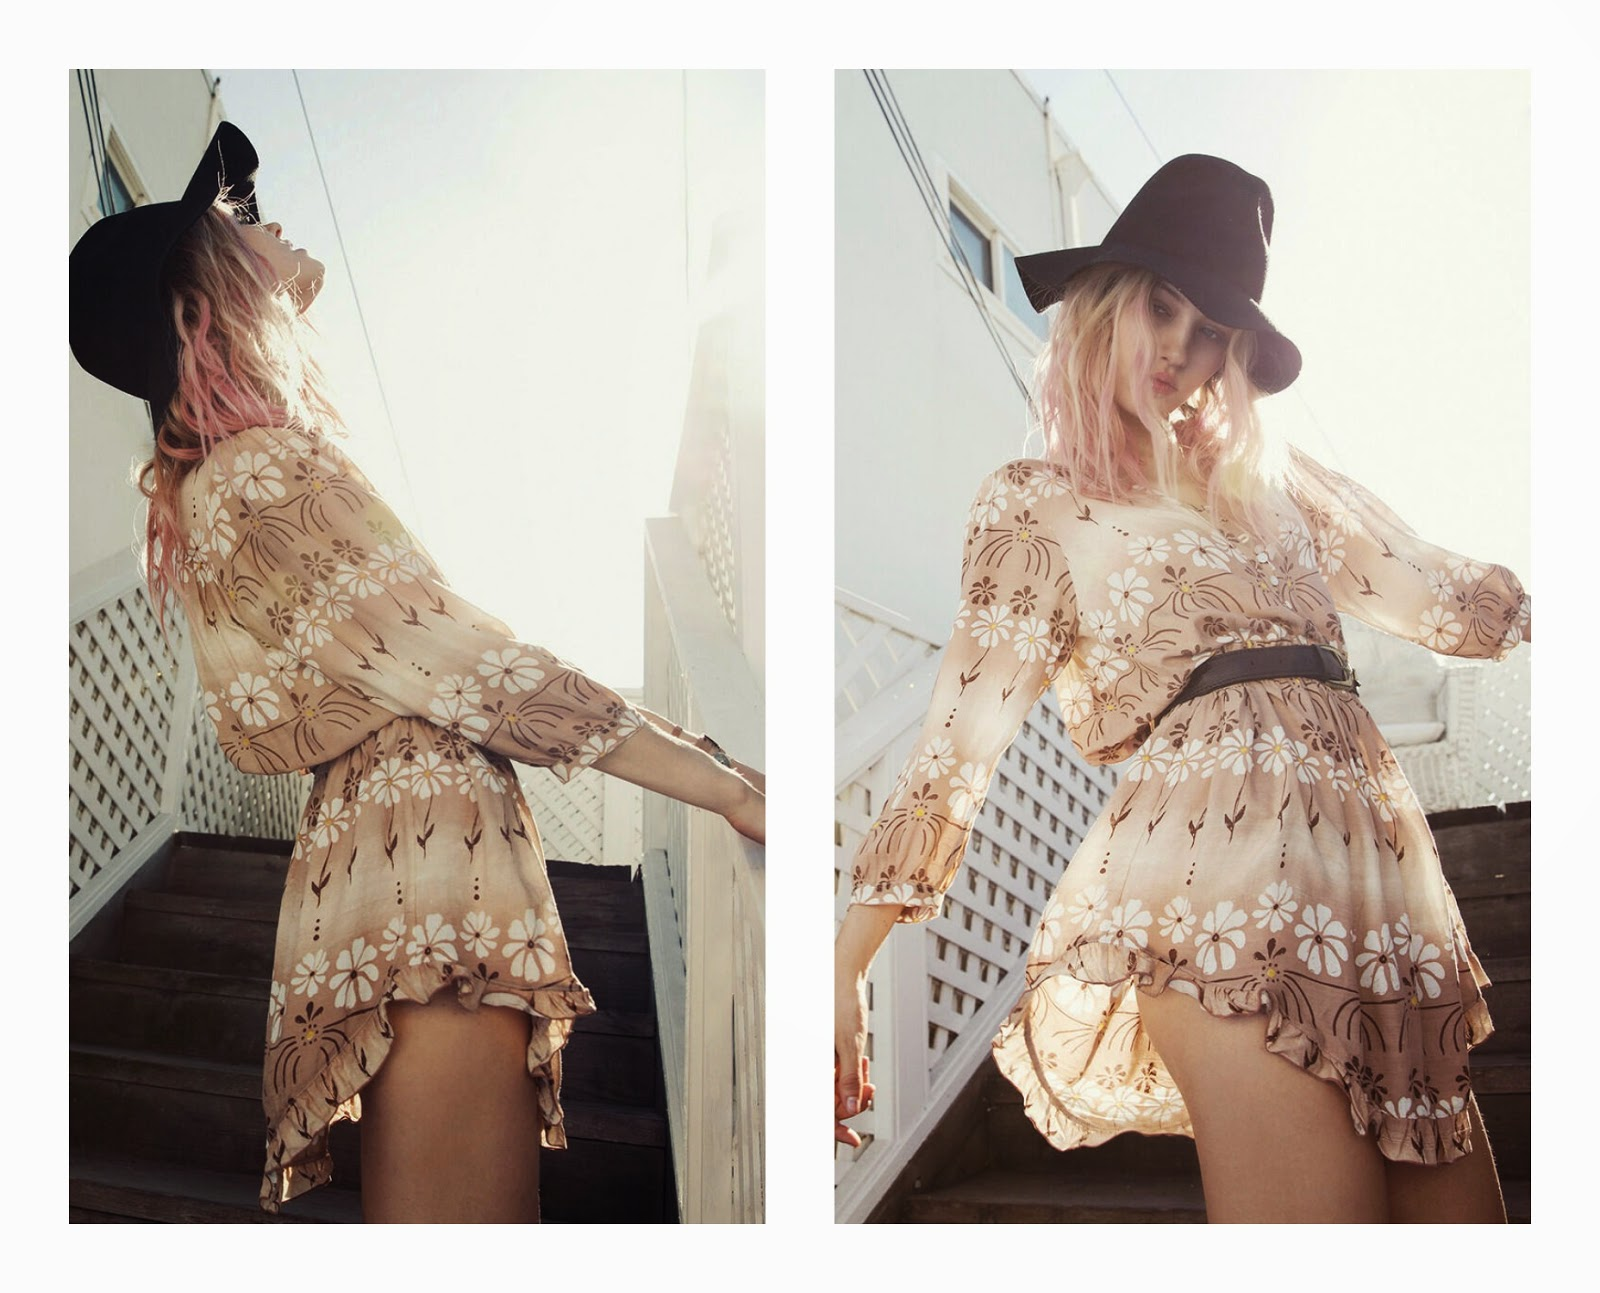 A Carefree Boho Spring 2014 Wardrobe